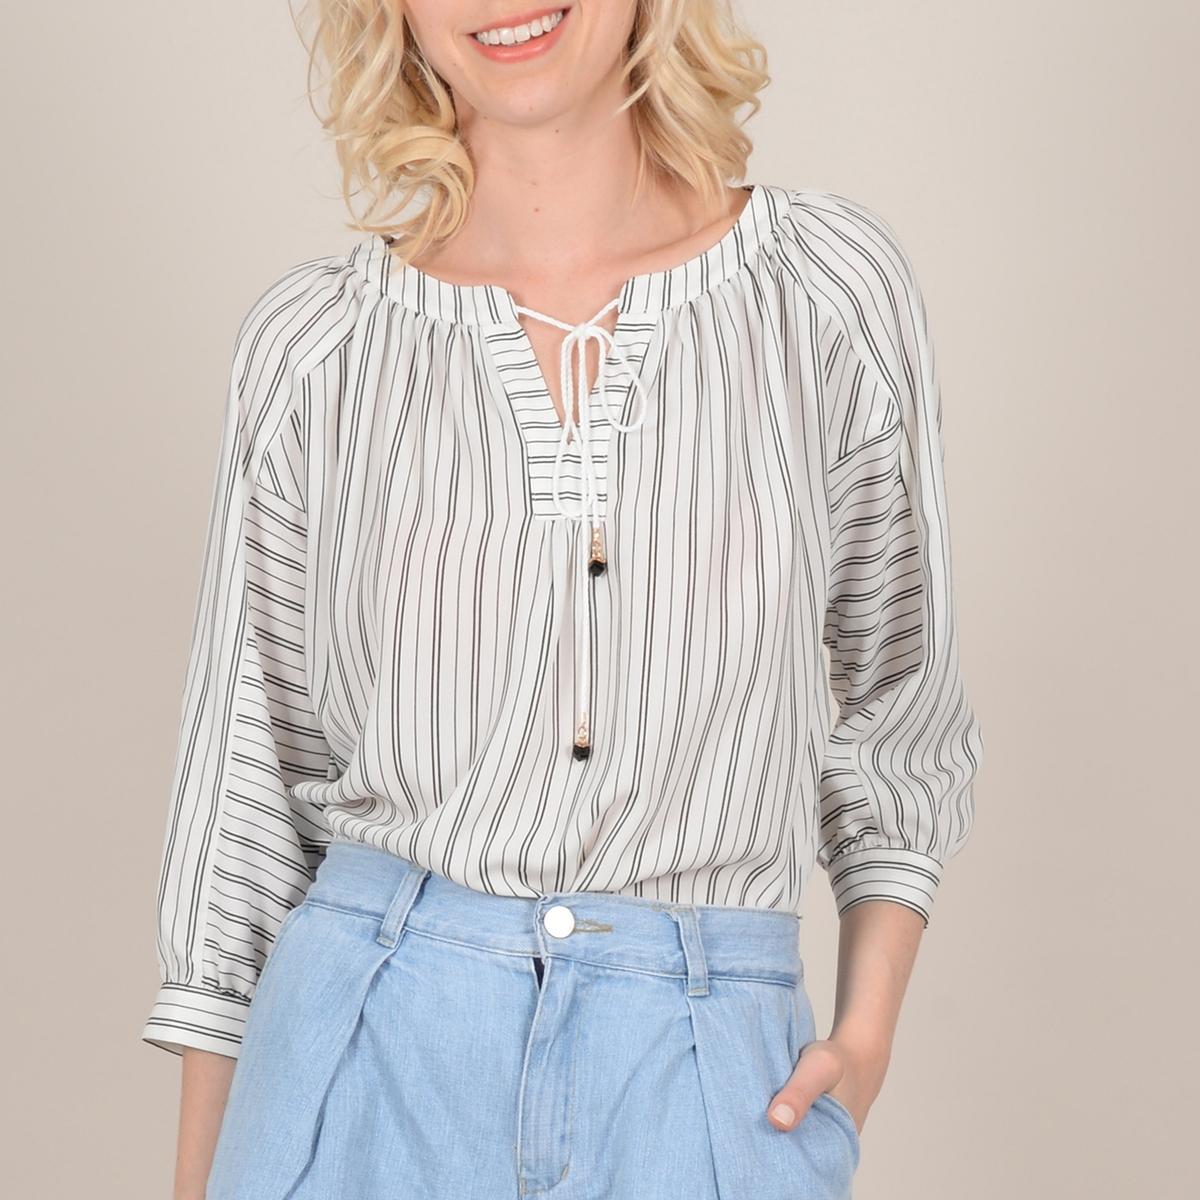 Блузка La Redoute Свободного покроя с вырезом с затягивающимся шнурком и рукавами S белый очки x try xtm401 wi fi steel grey